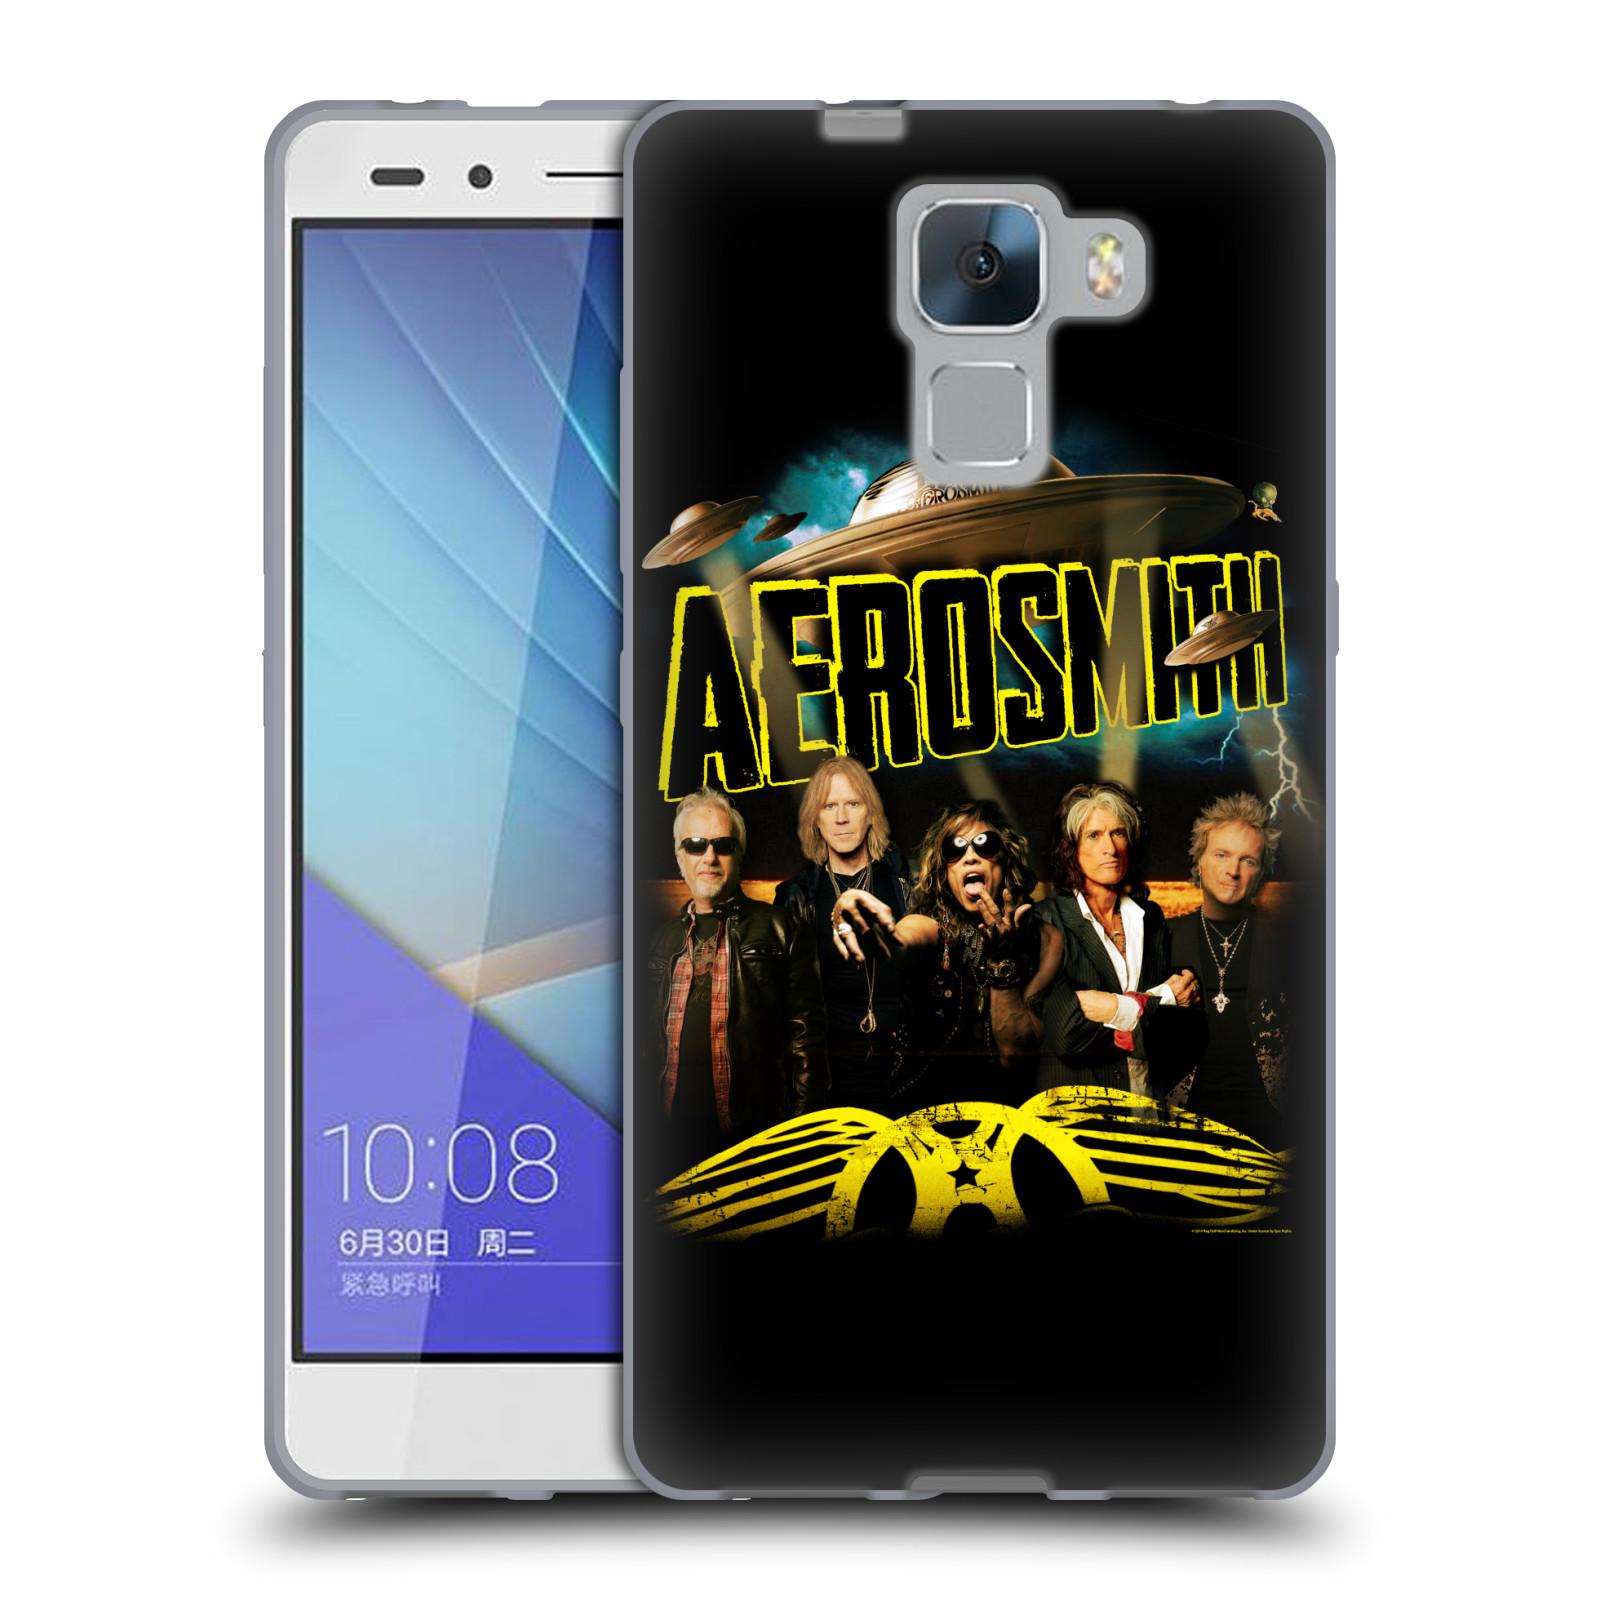 Silikonové pouzdro na mobil Honor 7 HEAD CASE - Aerosmith - Global Warming